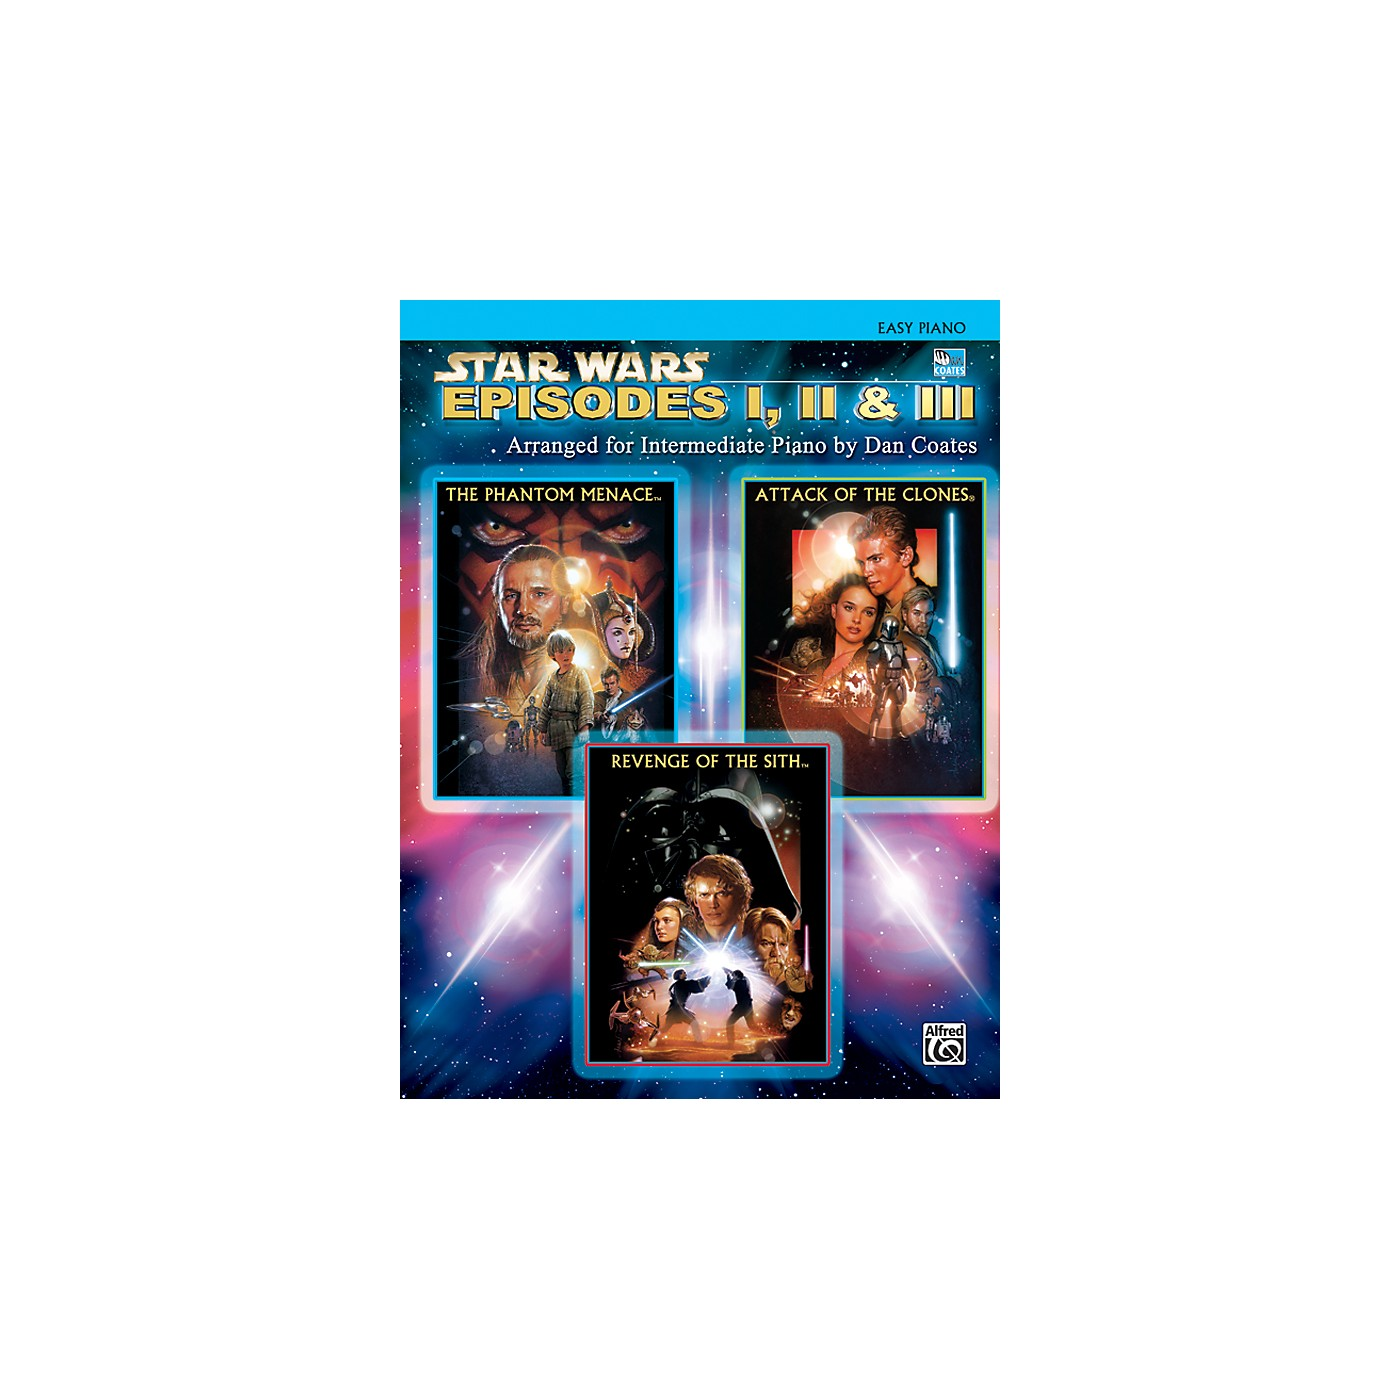 Alfred Star Wars: Episodes I, II & III Easy Piano Songbook thumbnail